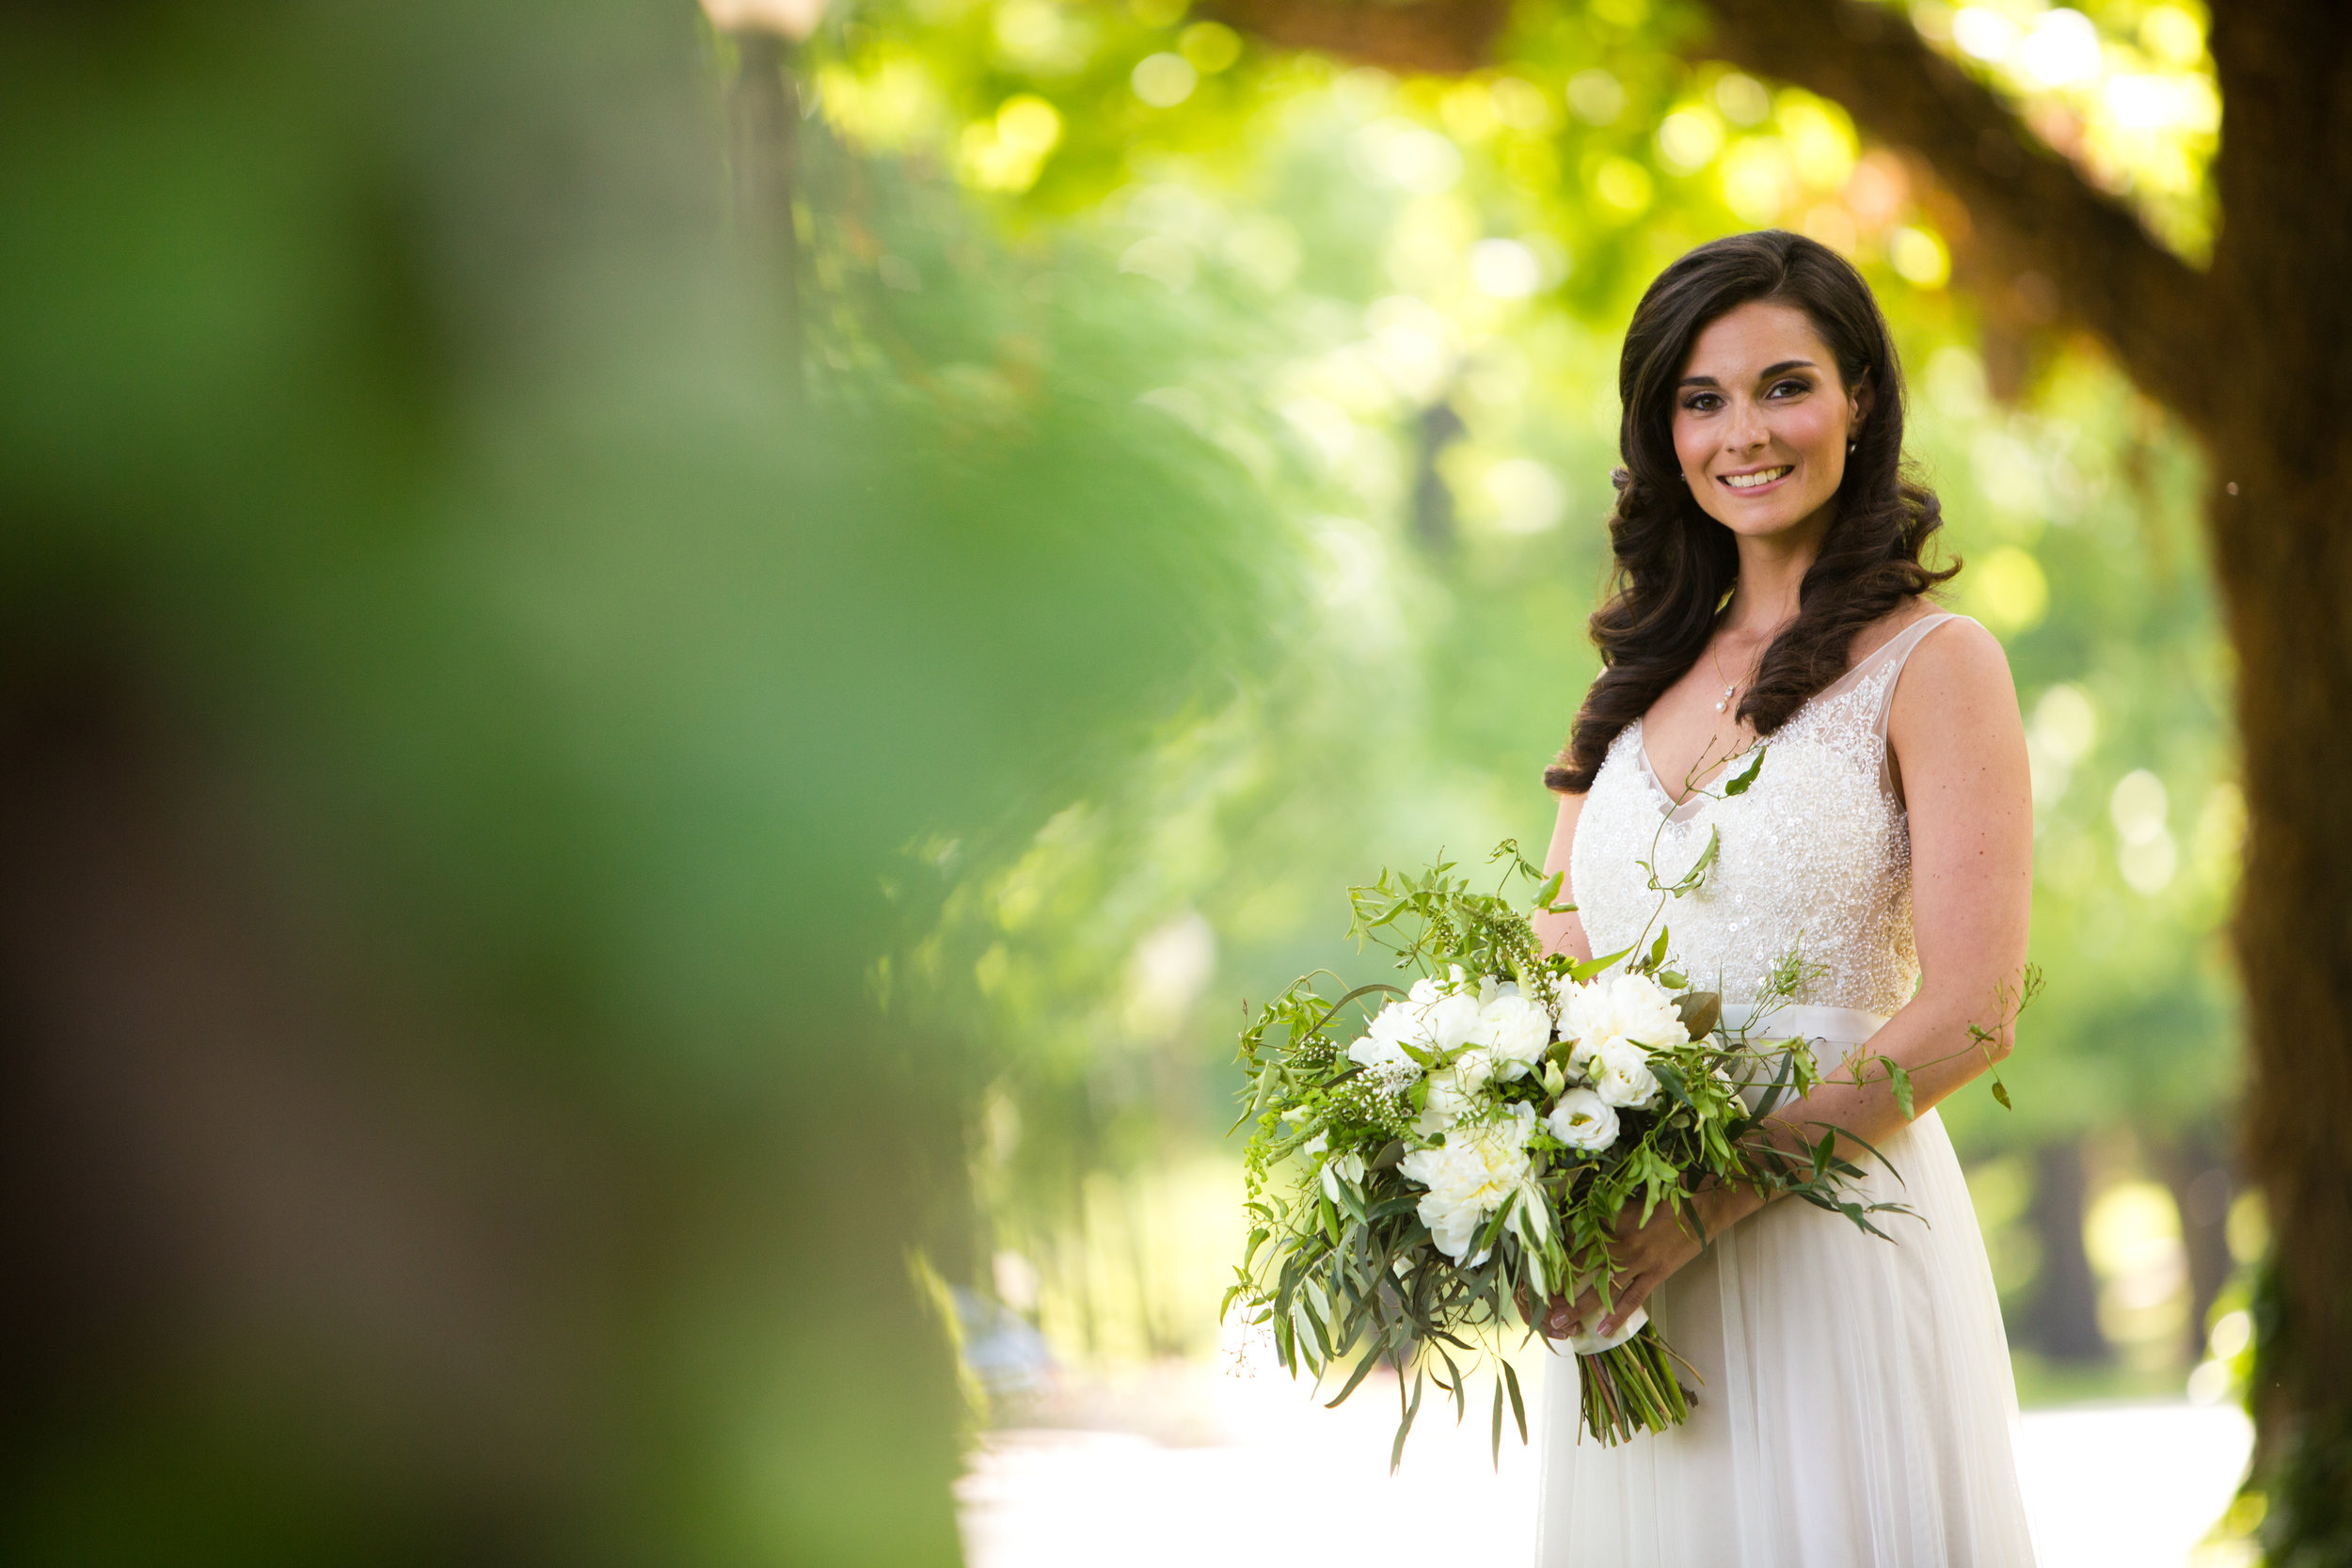 St. Louis Photographer St. Charles Photographer Engagement Wedding Photographer (41).jpg